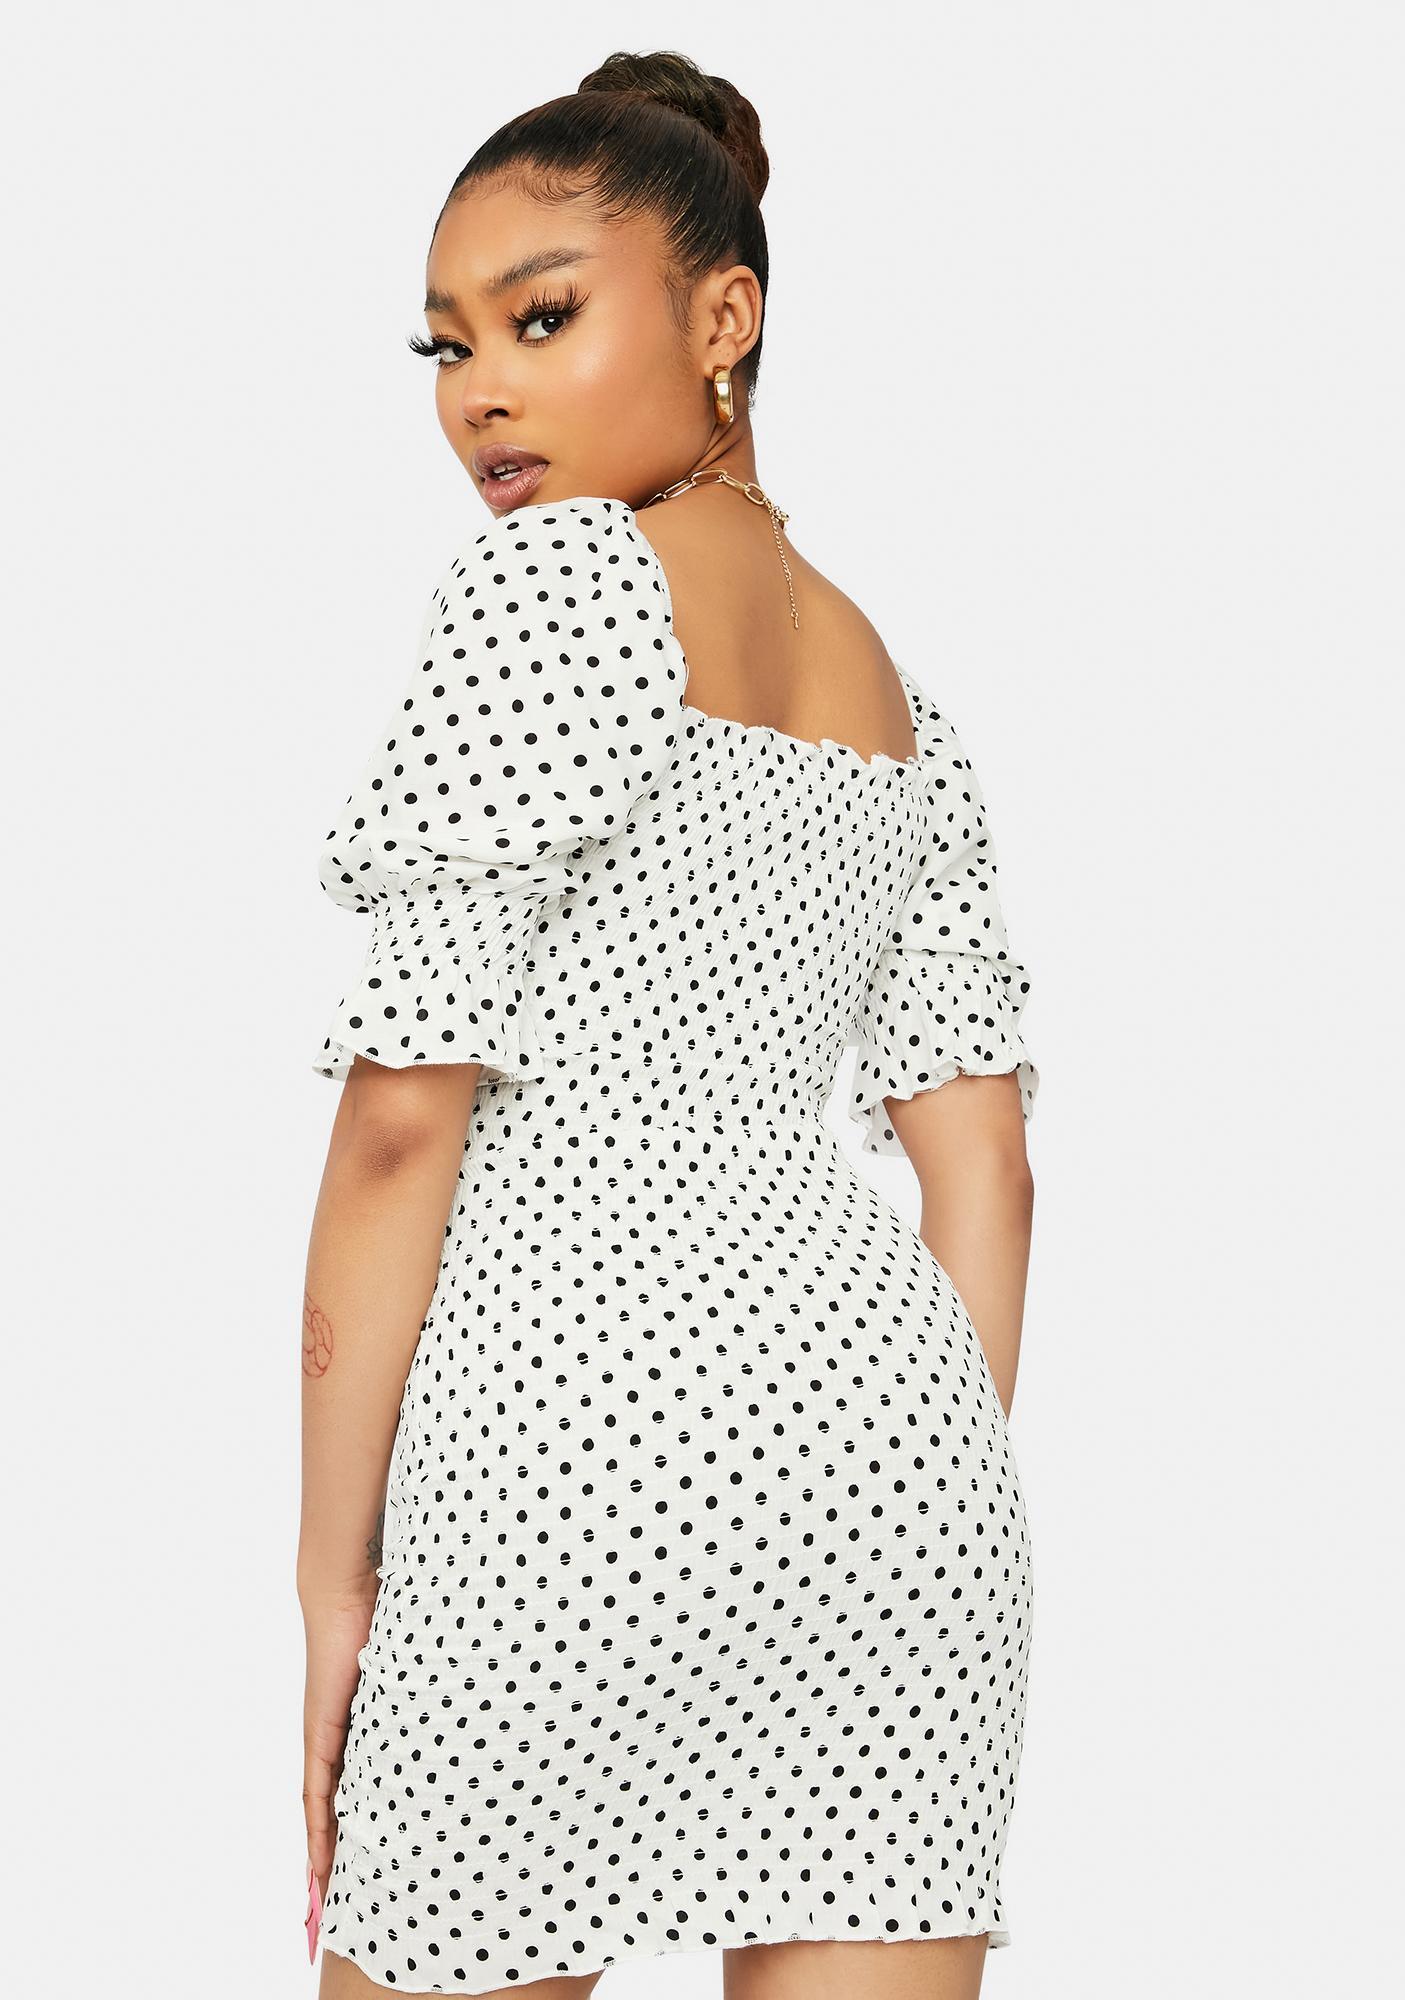 Ivory Sweet As Ever Polka Dot Puff Sleeve Dress